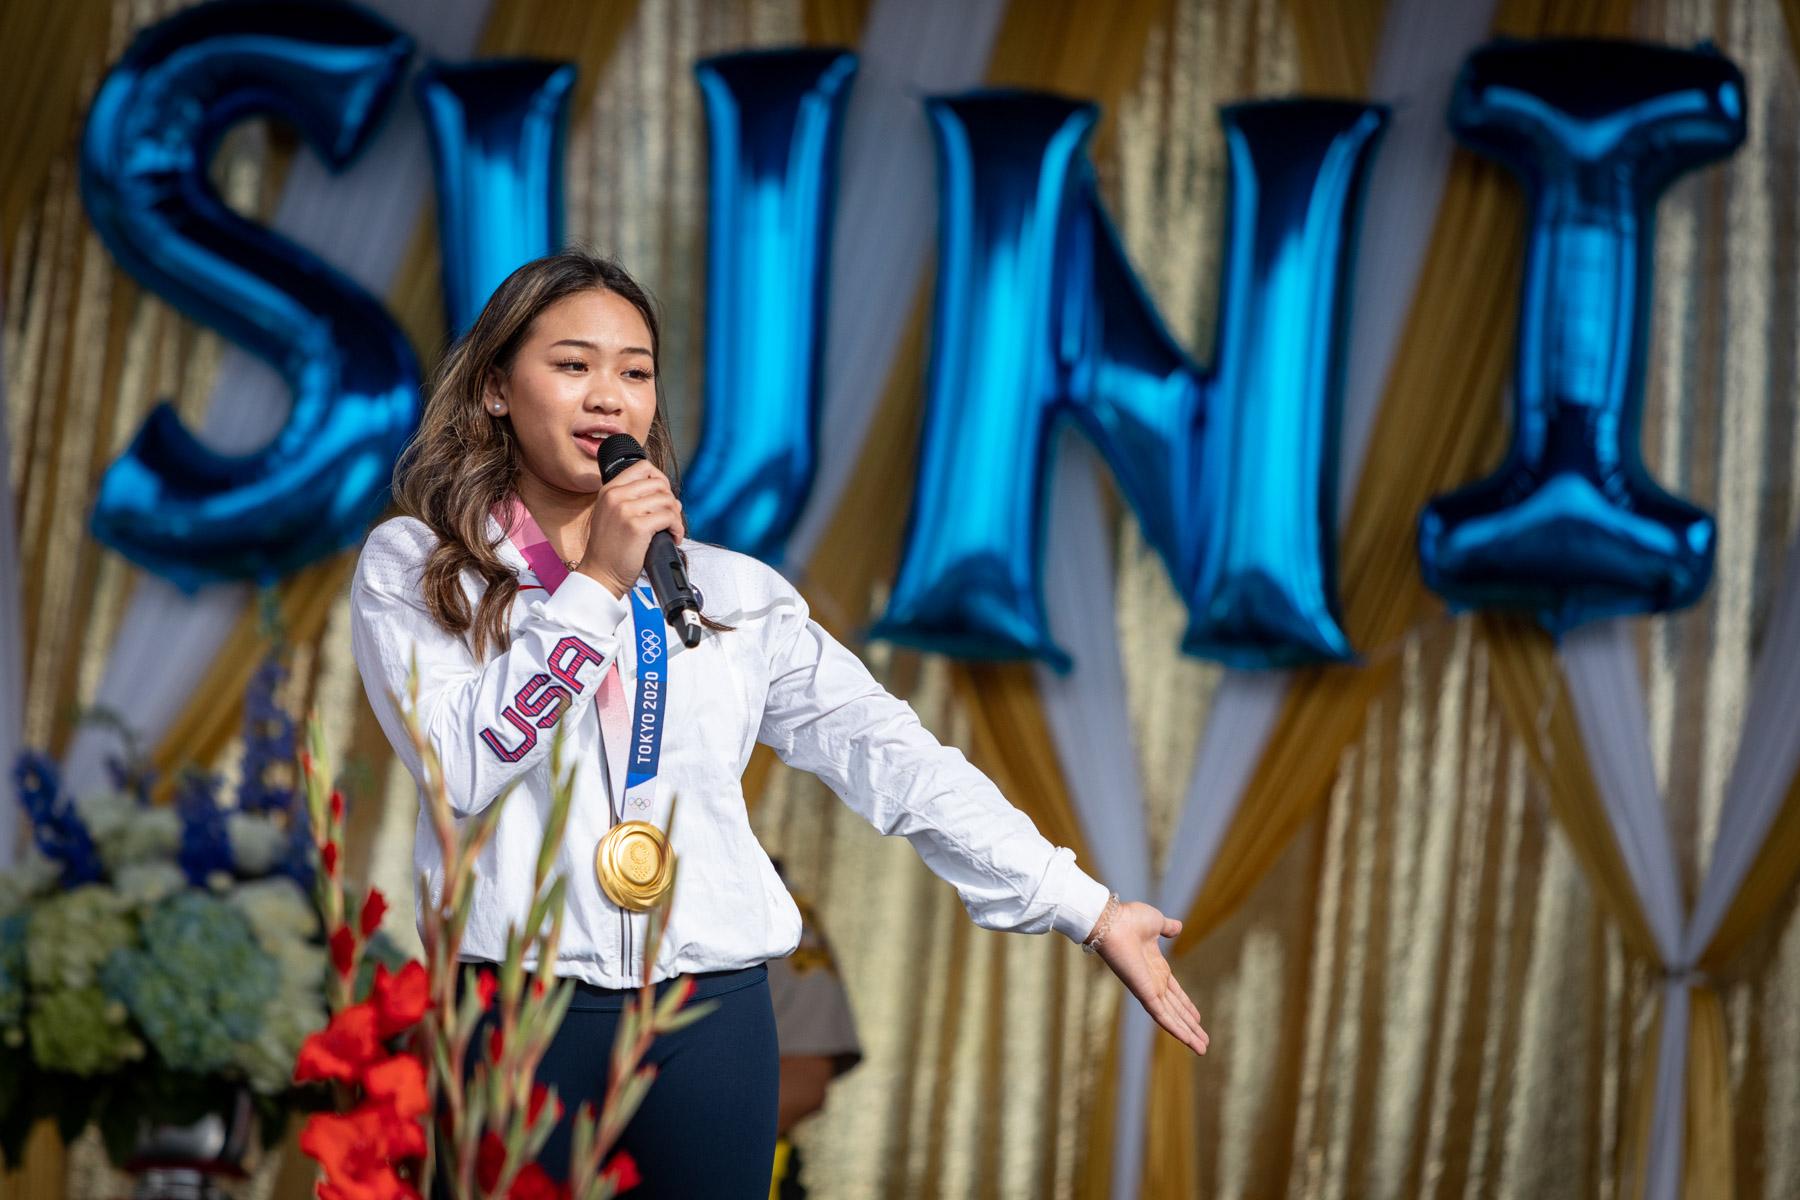 sahanjournal.com: Parade celebrates triumph of Hmong American Olympian Sunisa Lee